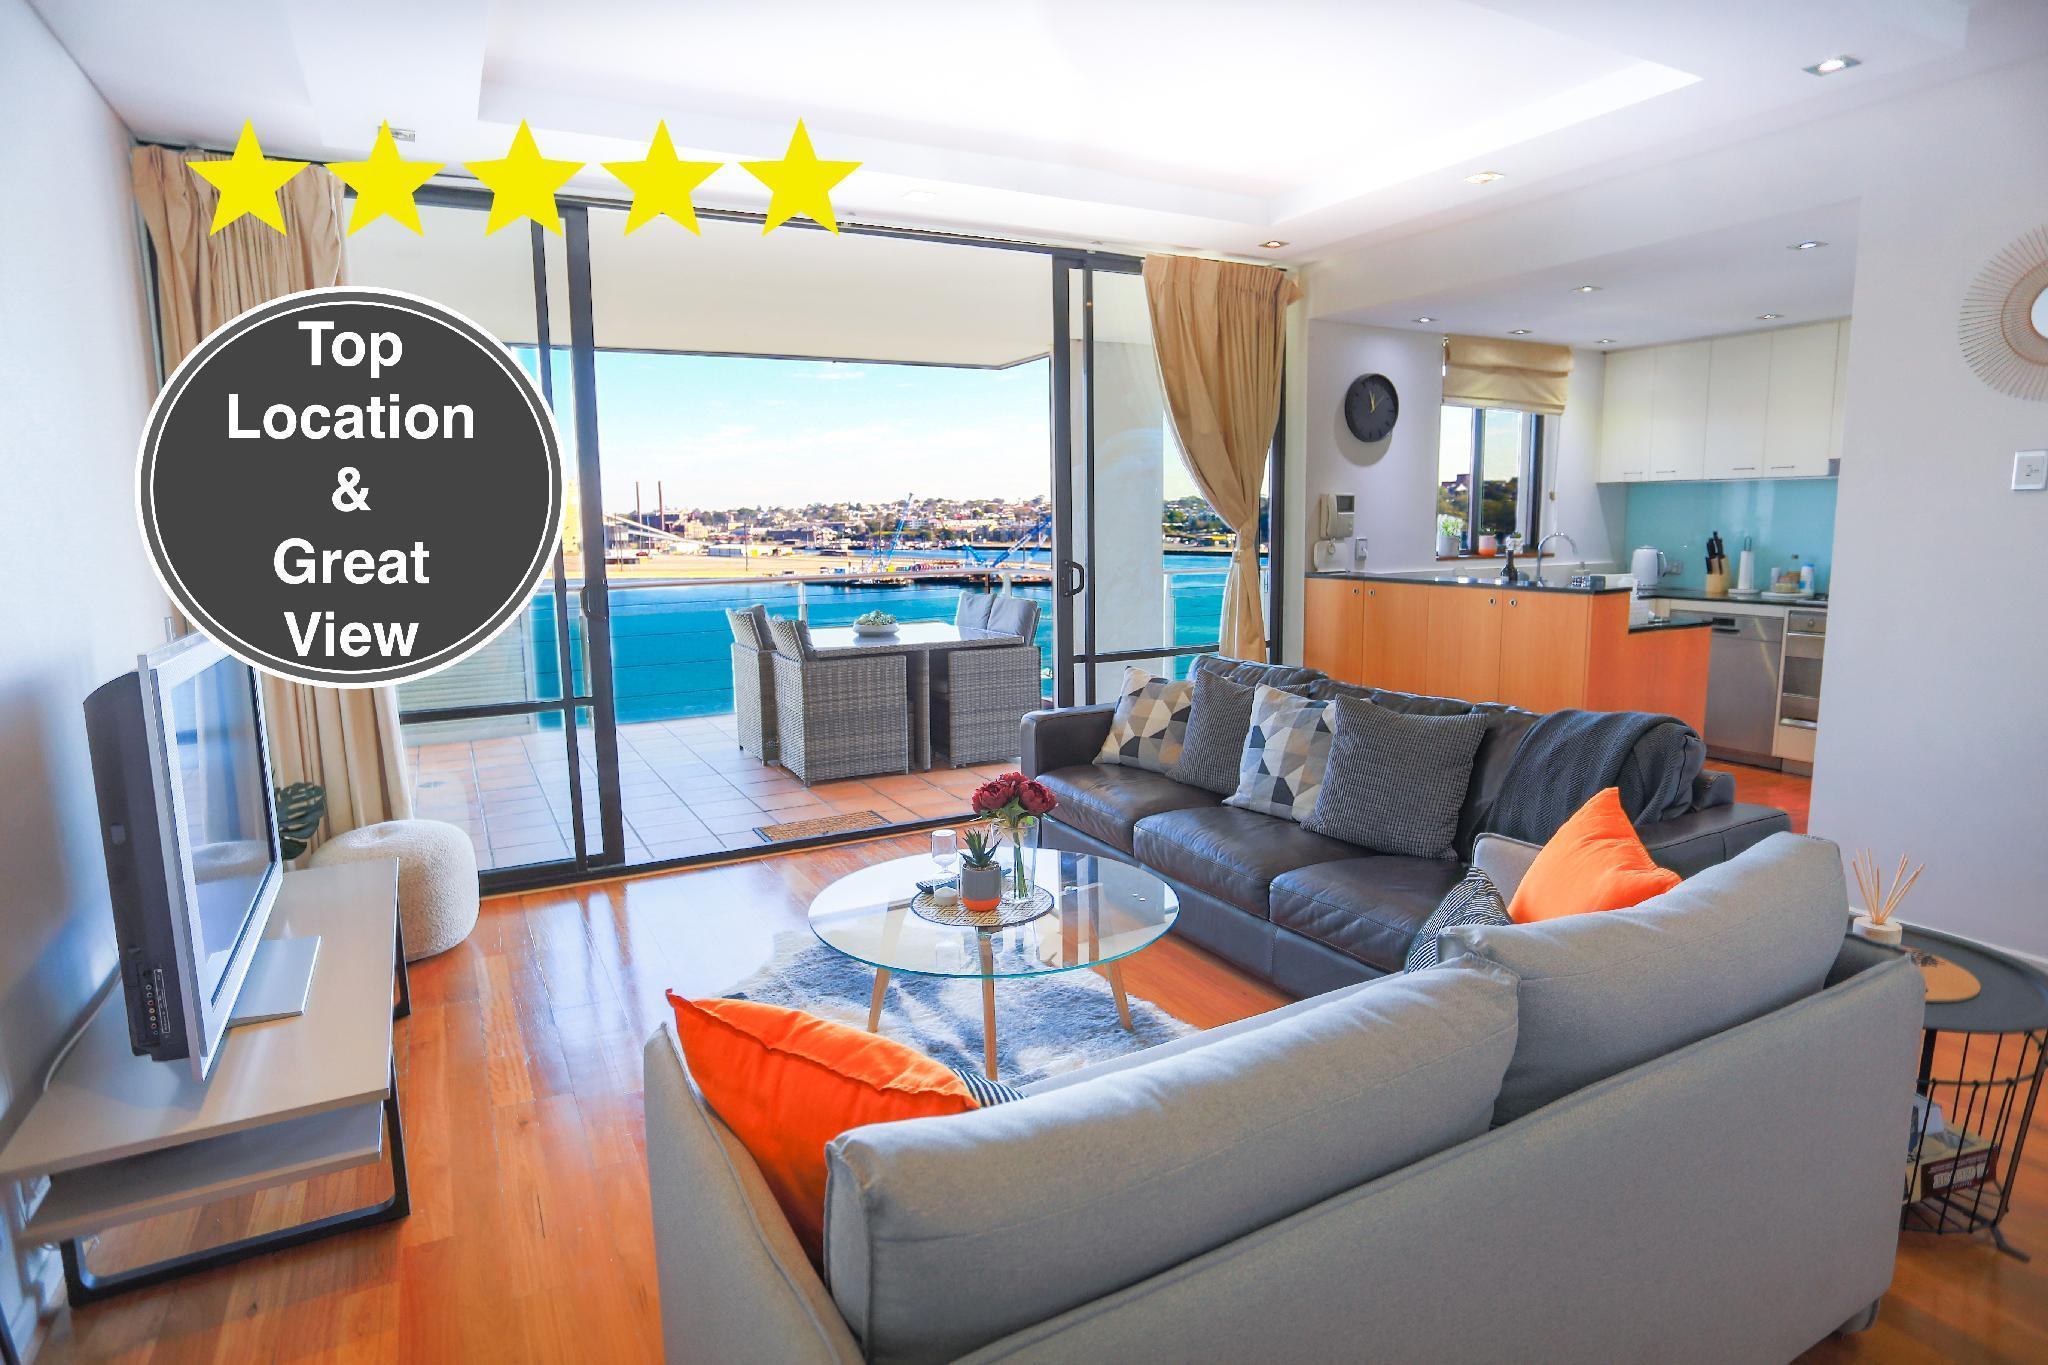 Sydney CBD 3BR Luxury Waterside Apartment